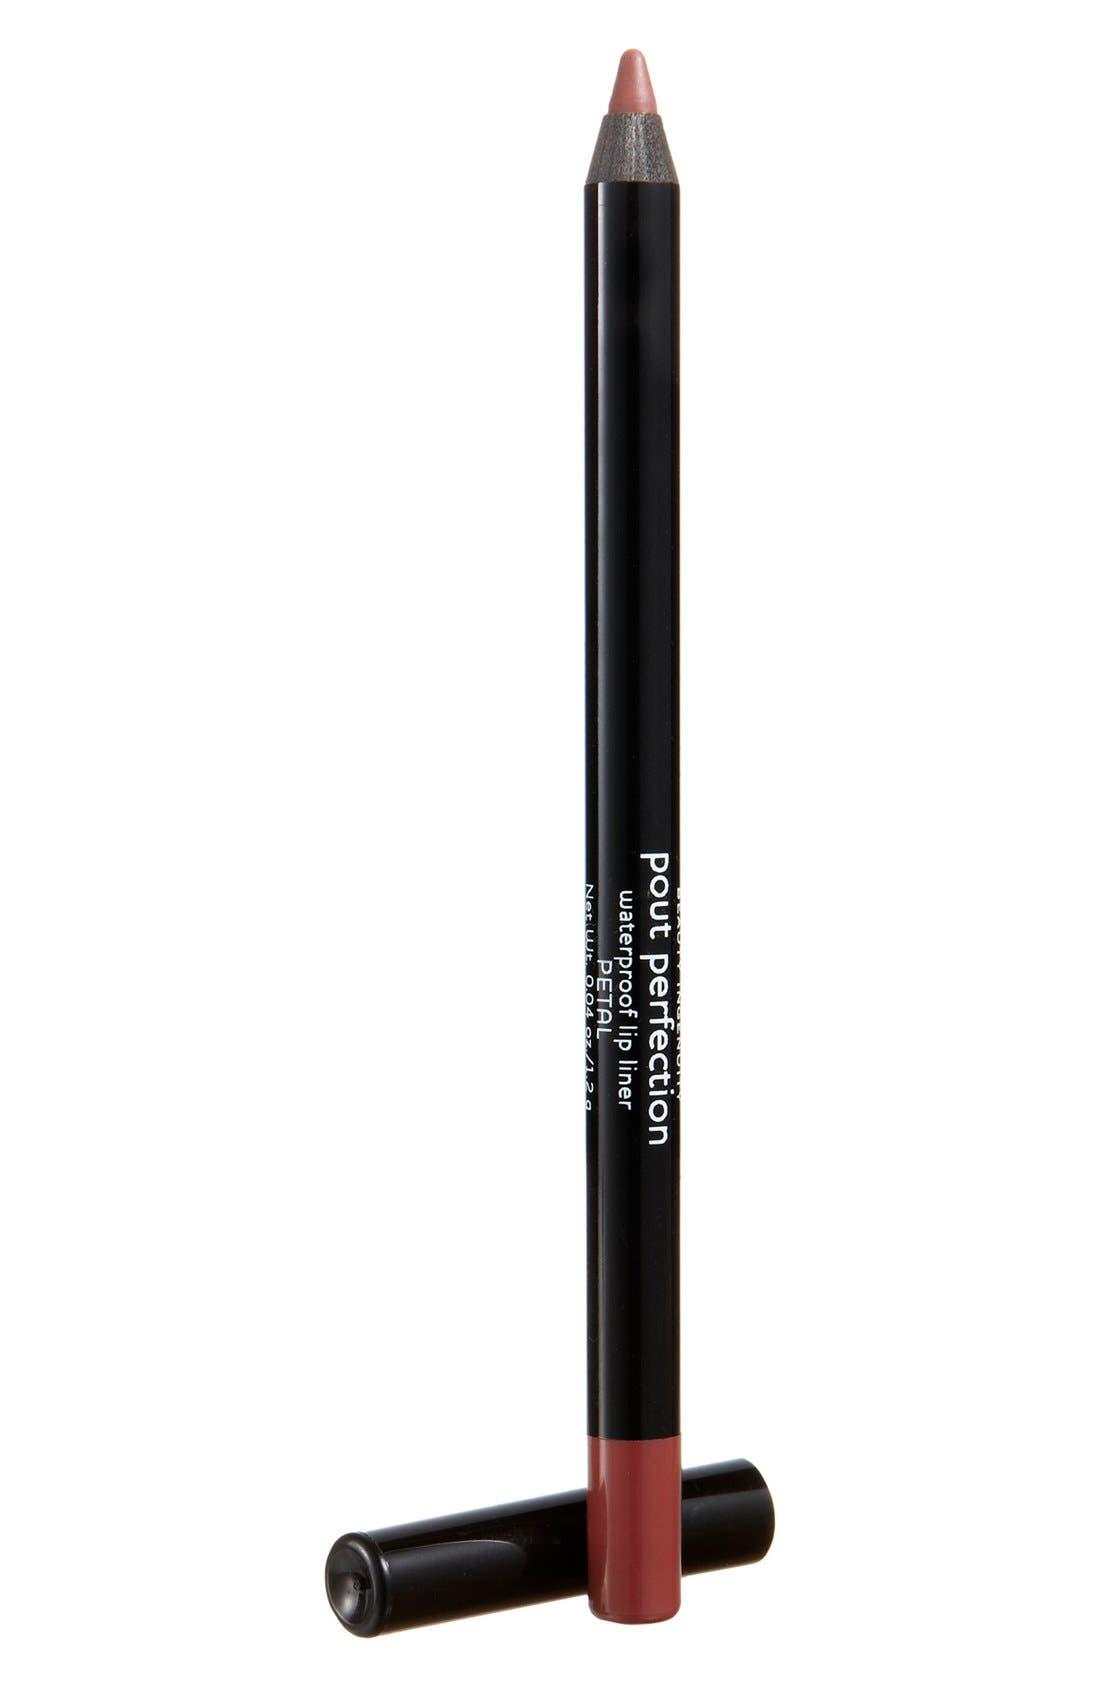 Pout Perfection Waterproof Lip Liner,                             Main thumbnail 1, color,                             PETAL